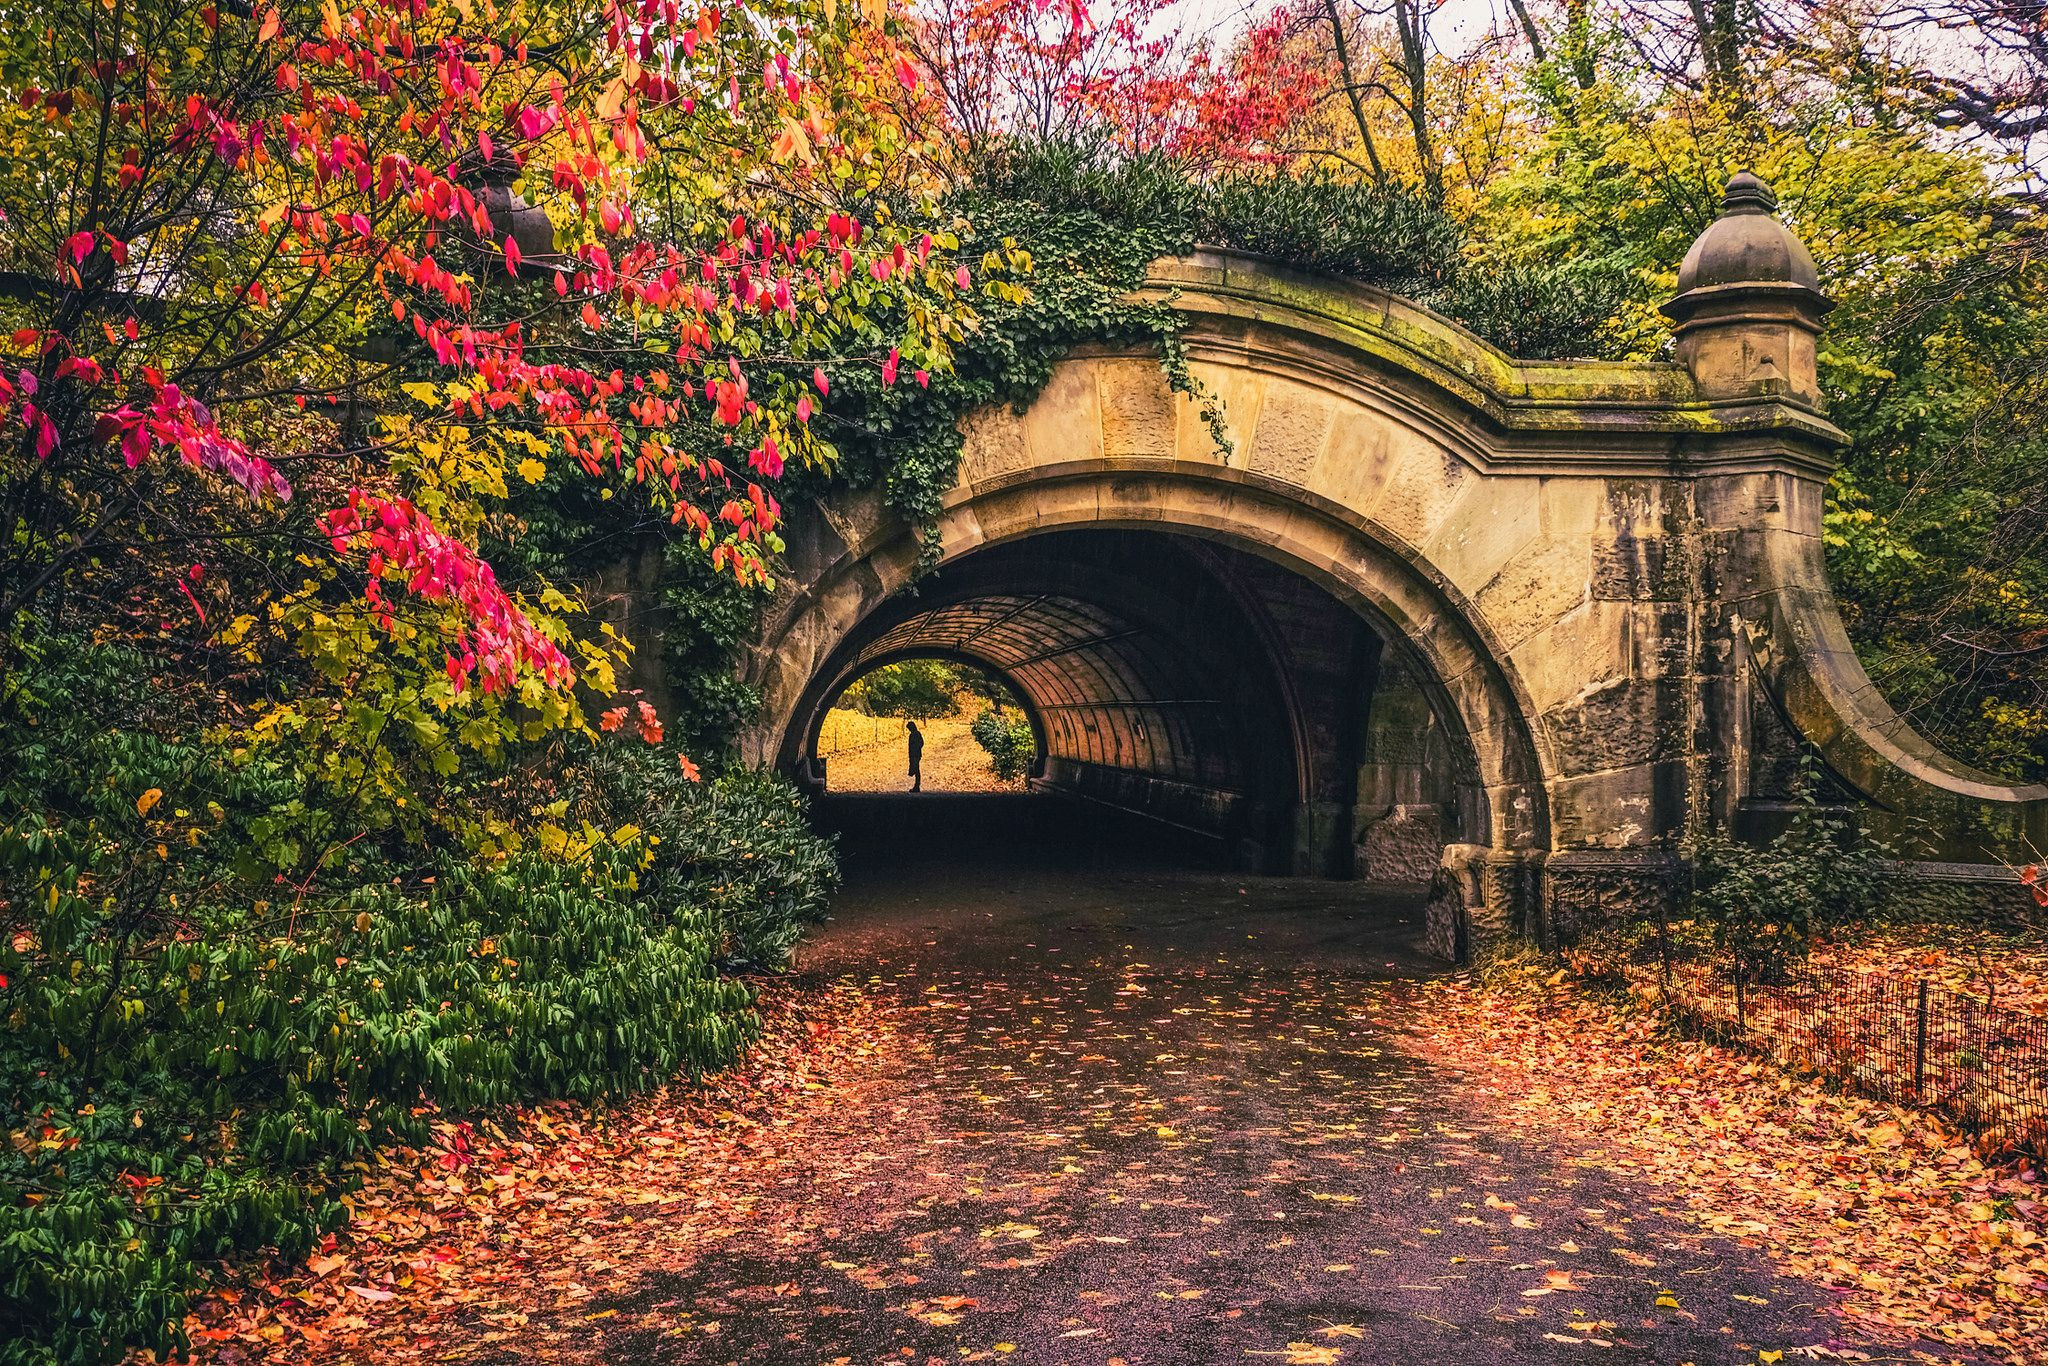 Brooklyn Autumn in Prospect Park New York City Autumn Fall foliage in Prospect Park Brooklyn New York City